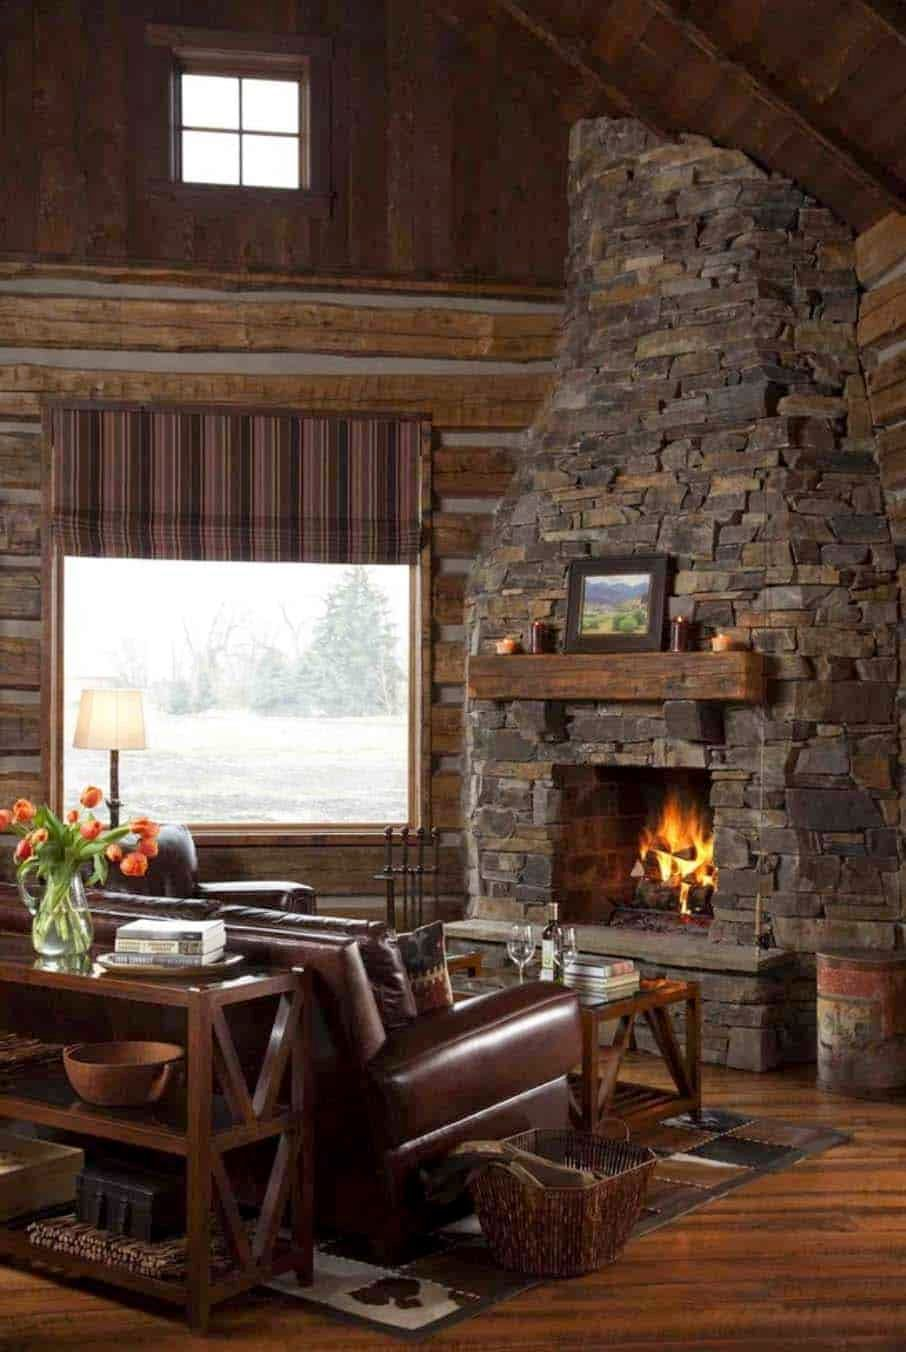 Cozy-Rustic-Cabin-Retreat-1-Kindesign.jpg